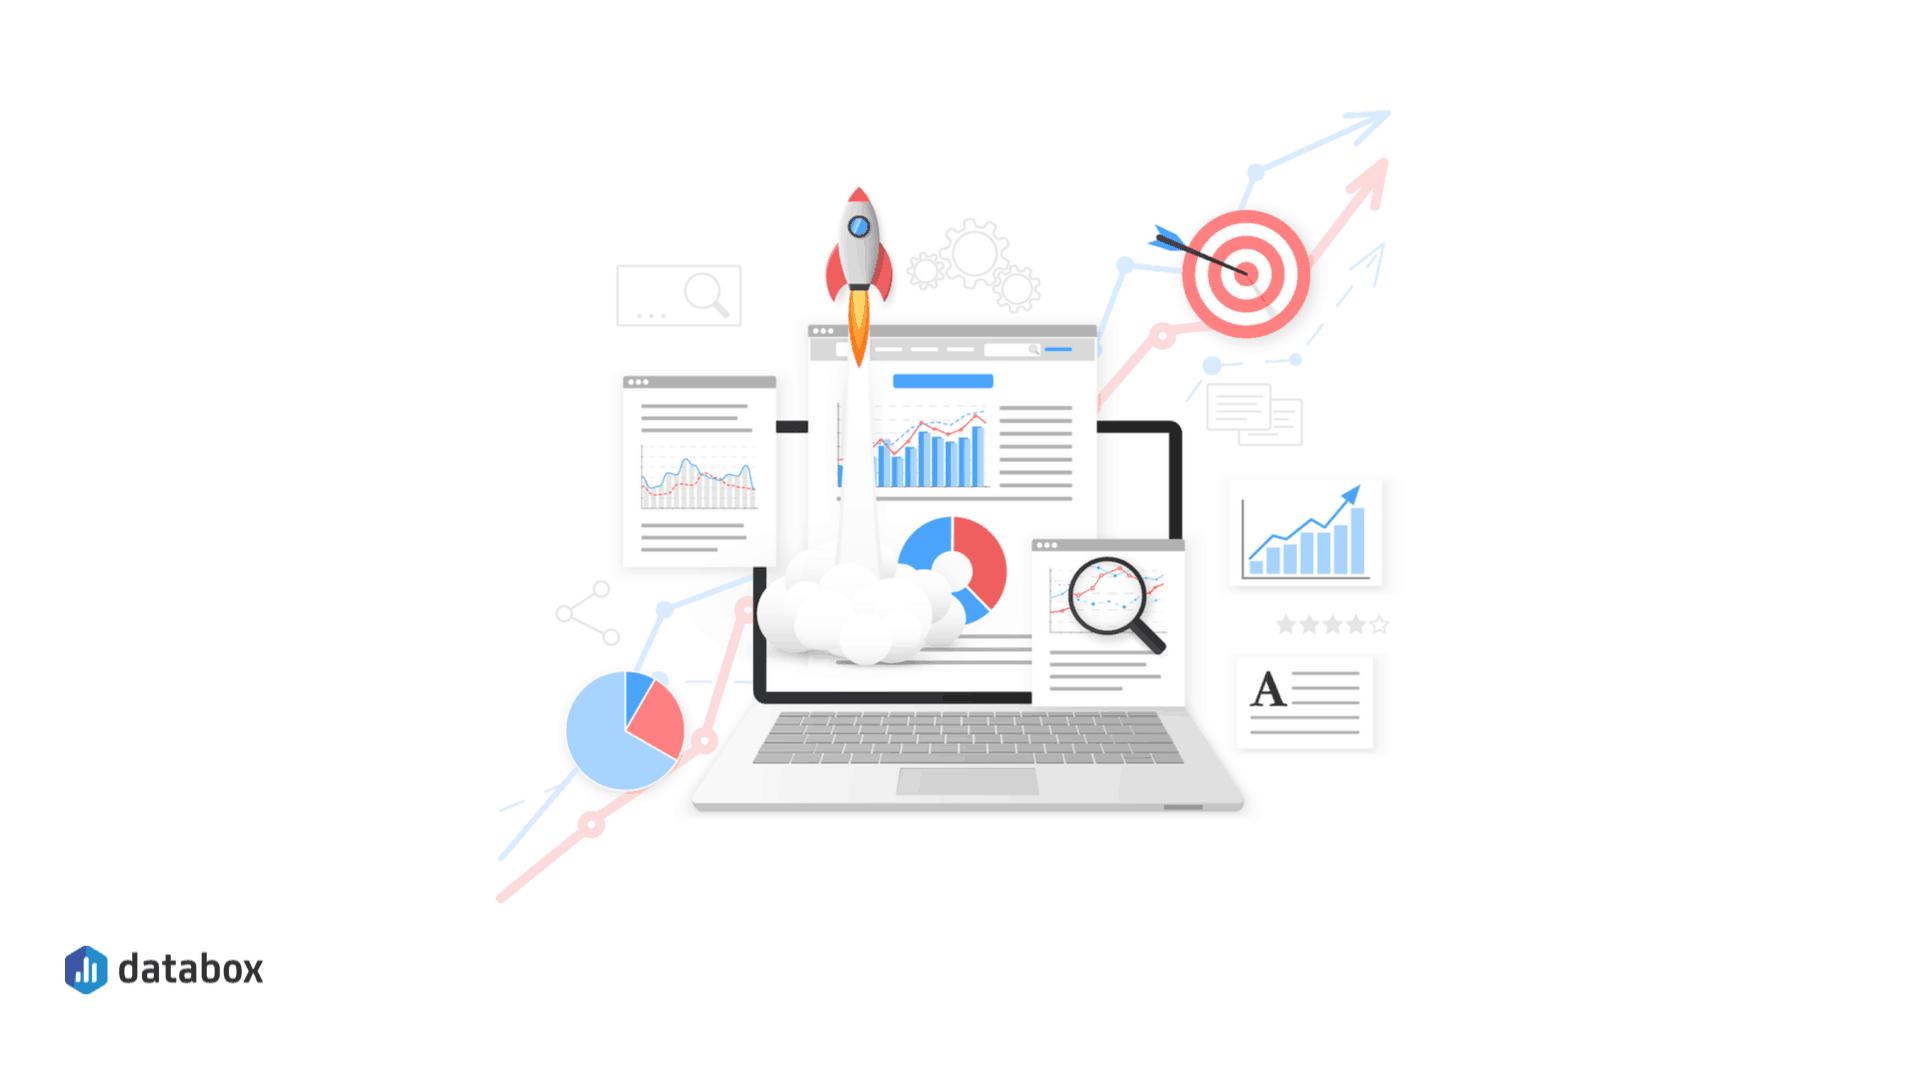 https://cdnwebsite.databox.com/wp-content/uploads/2019/09/23125904/How-to-analyze-data.png